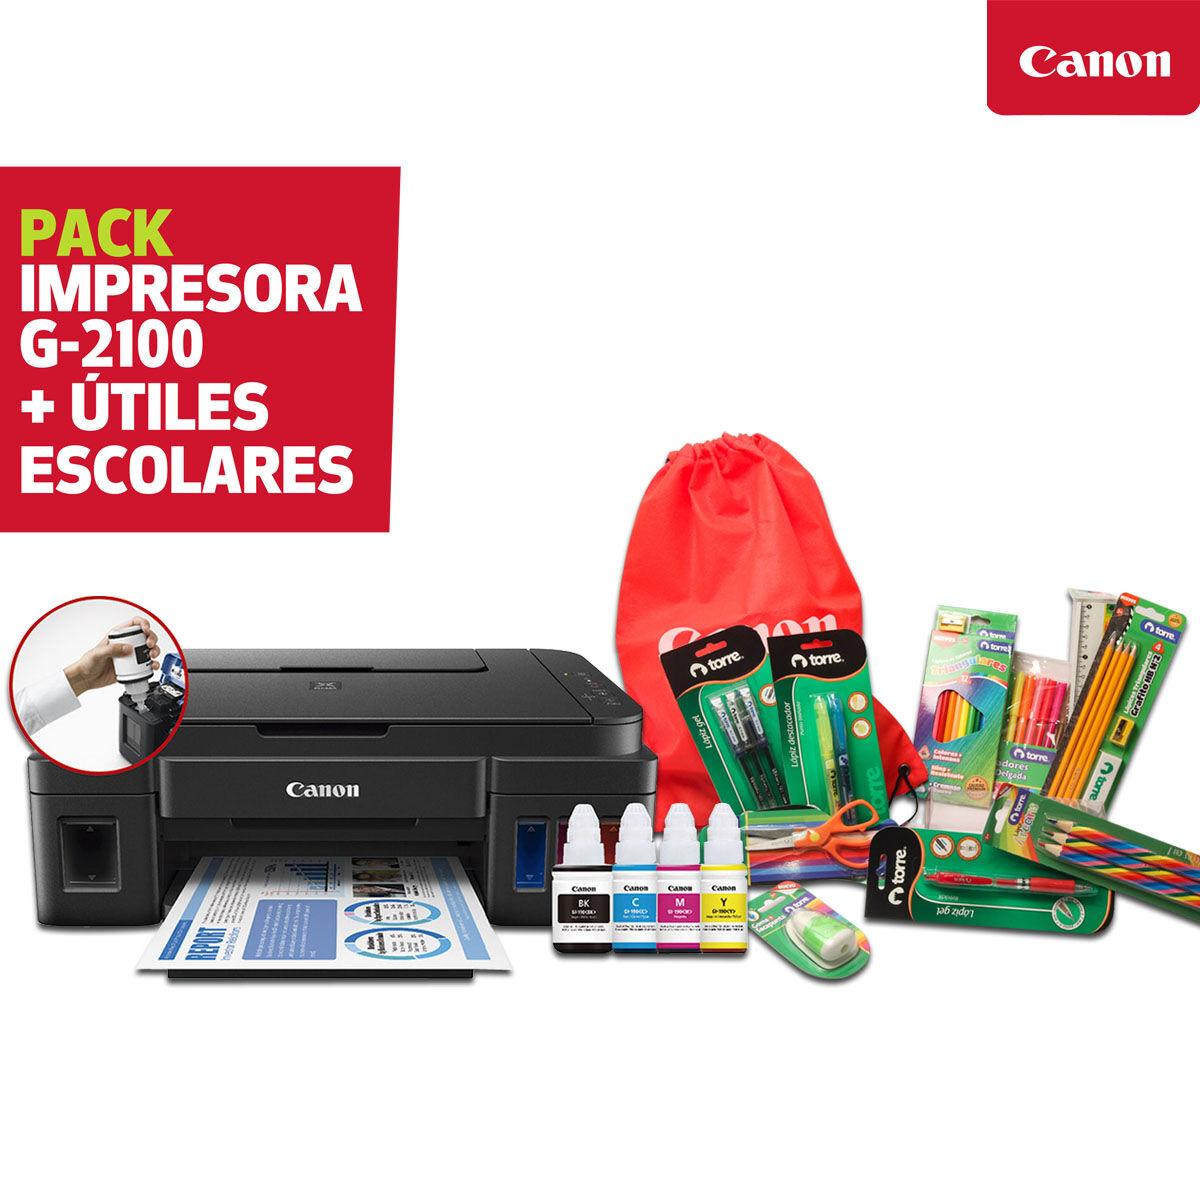 Multifuncional Canon Tinta Continua G-2100 + Kit Escolar Torre